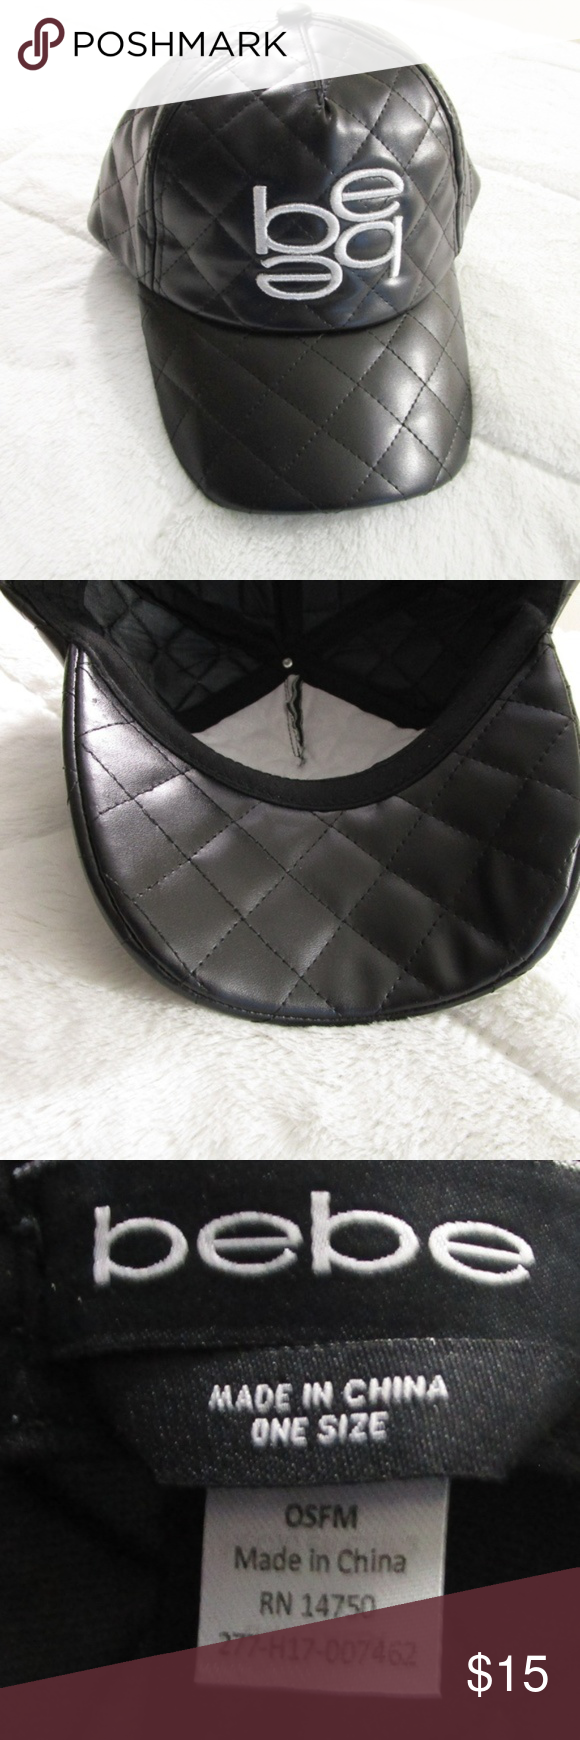 Bebe Black Faux Leather Baseball Cap wSilver Logo NWT